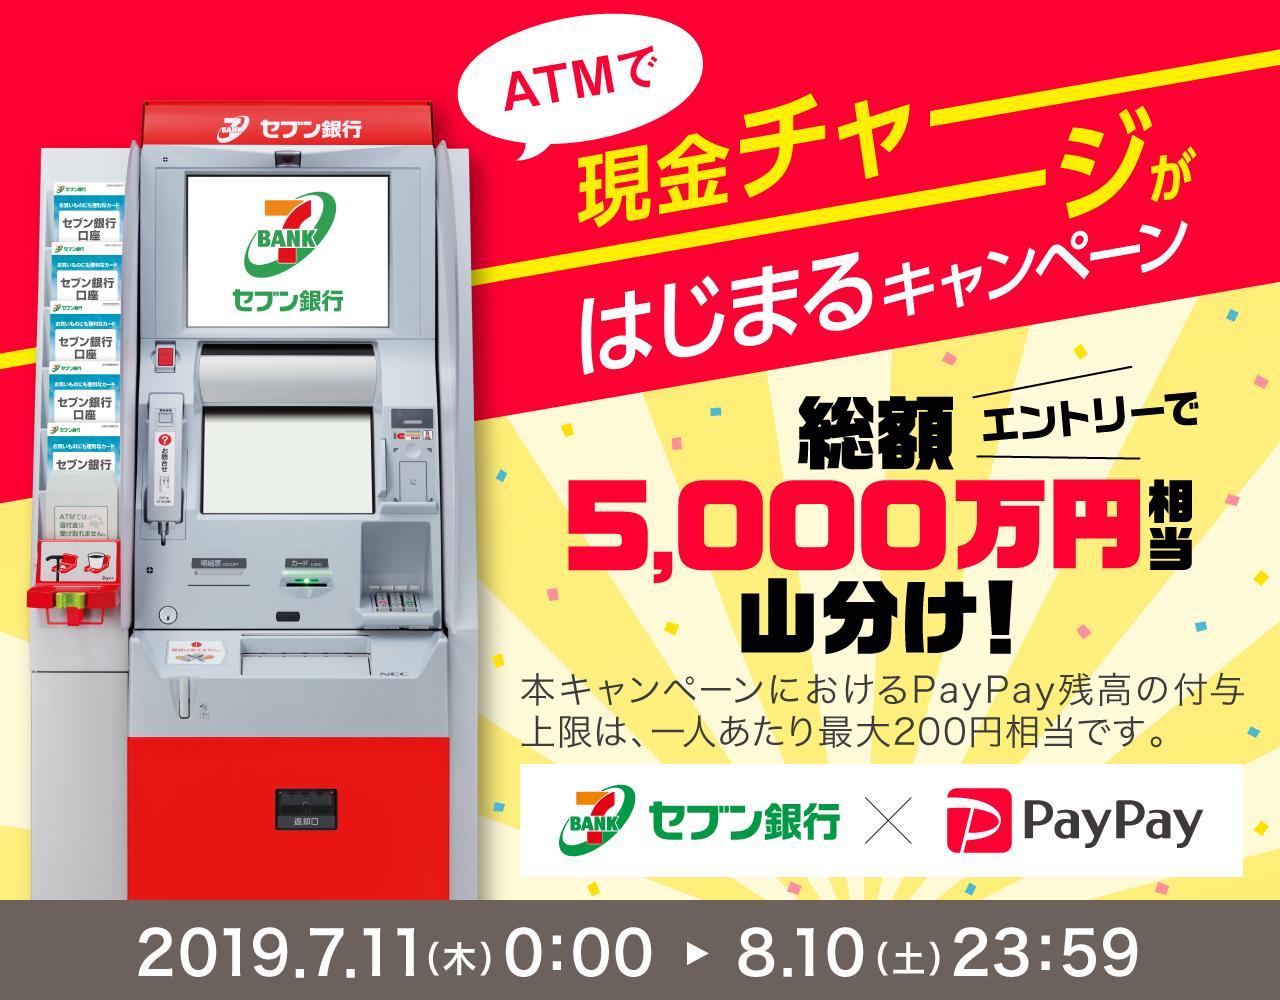 ATMで現金チャージが始まるキャンペーン エントリーで総額5,000万円相当山分け!